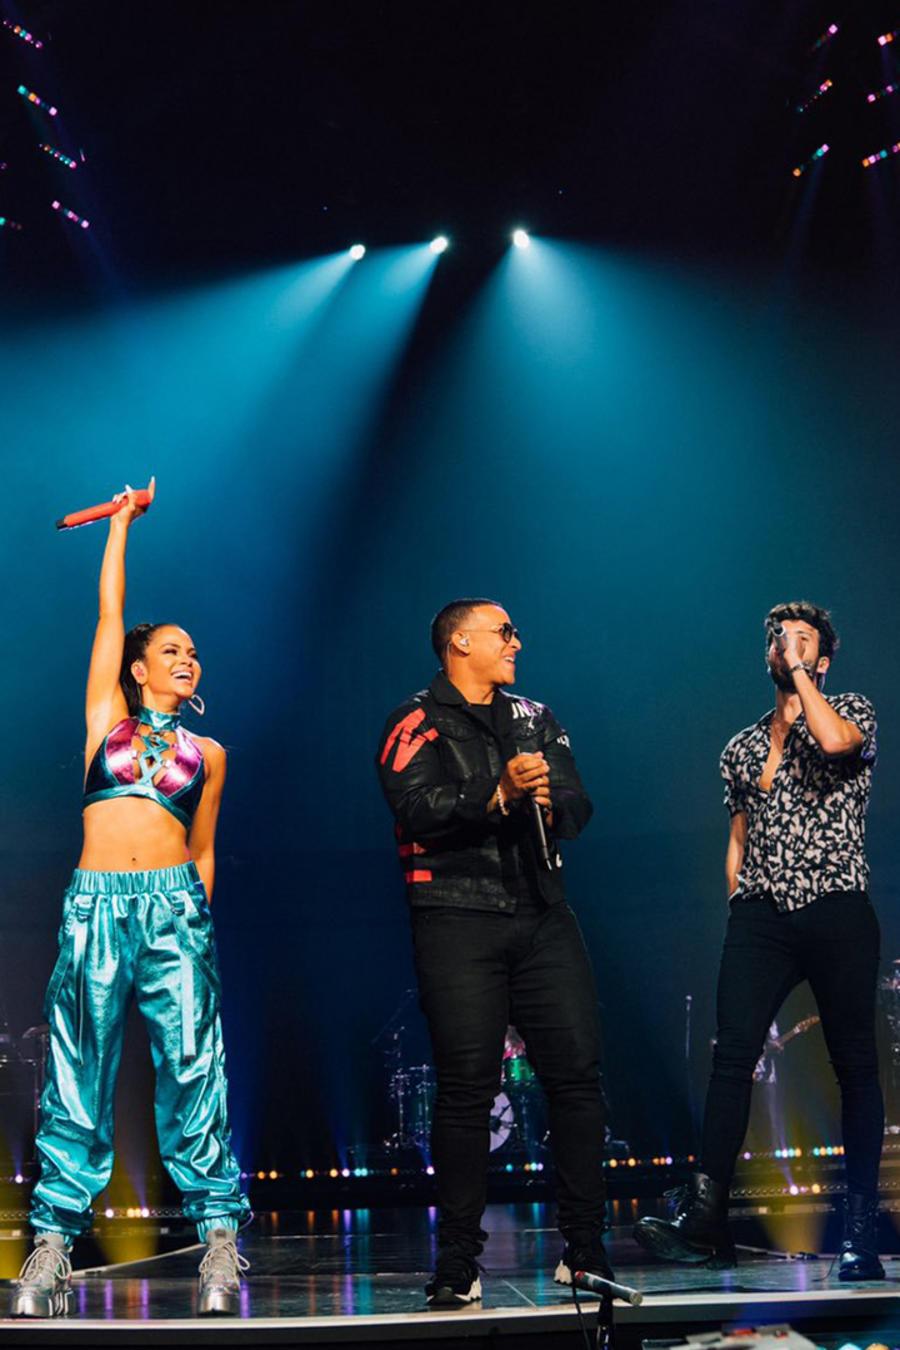 Sebastian Yatra, Natti Natasha & Daddy Yankee Join the Jonas Brothers on Stage in Miami